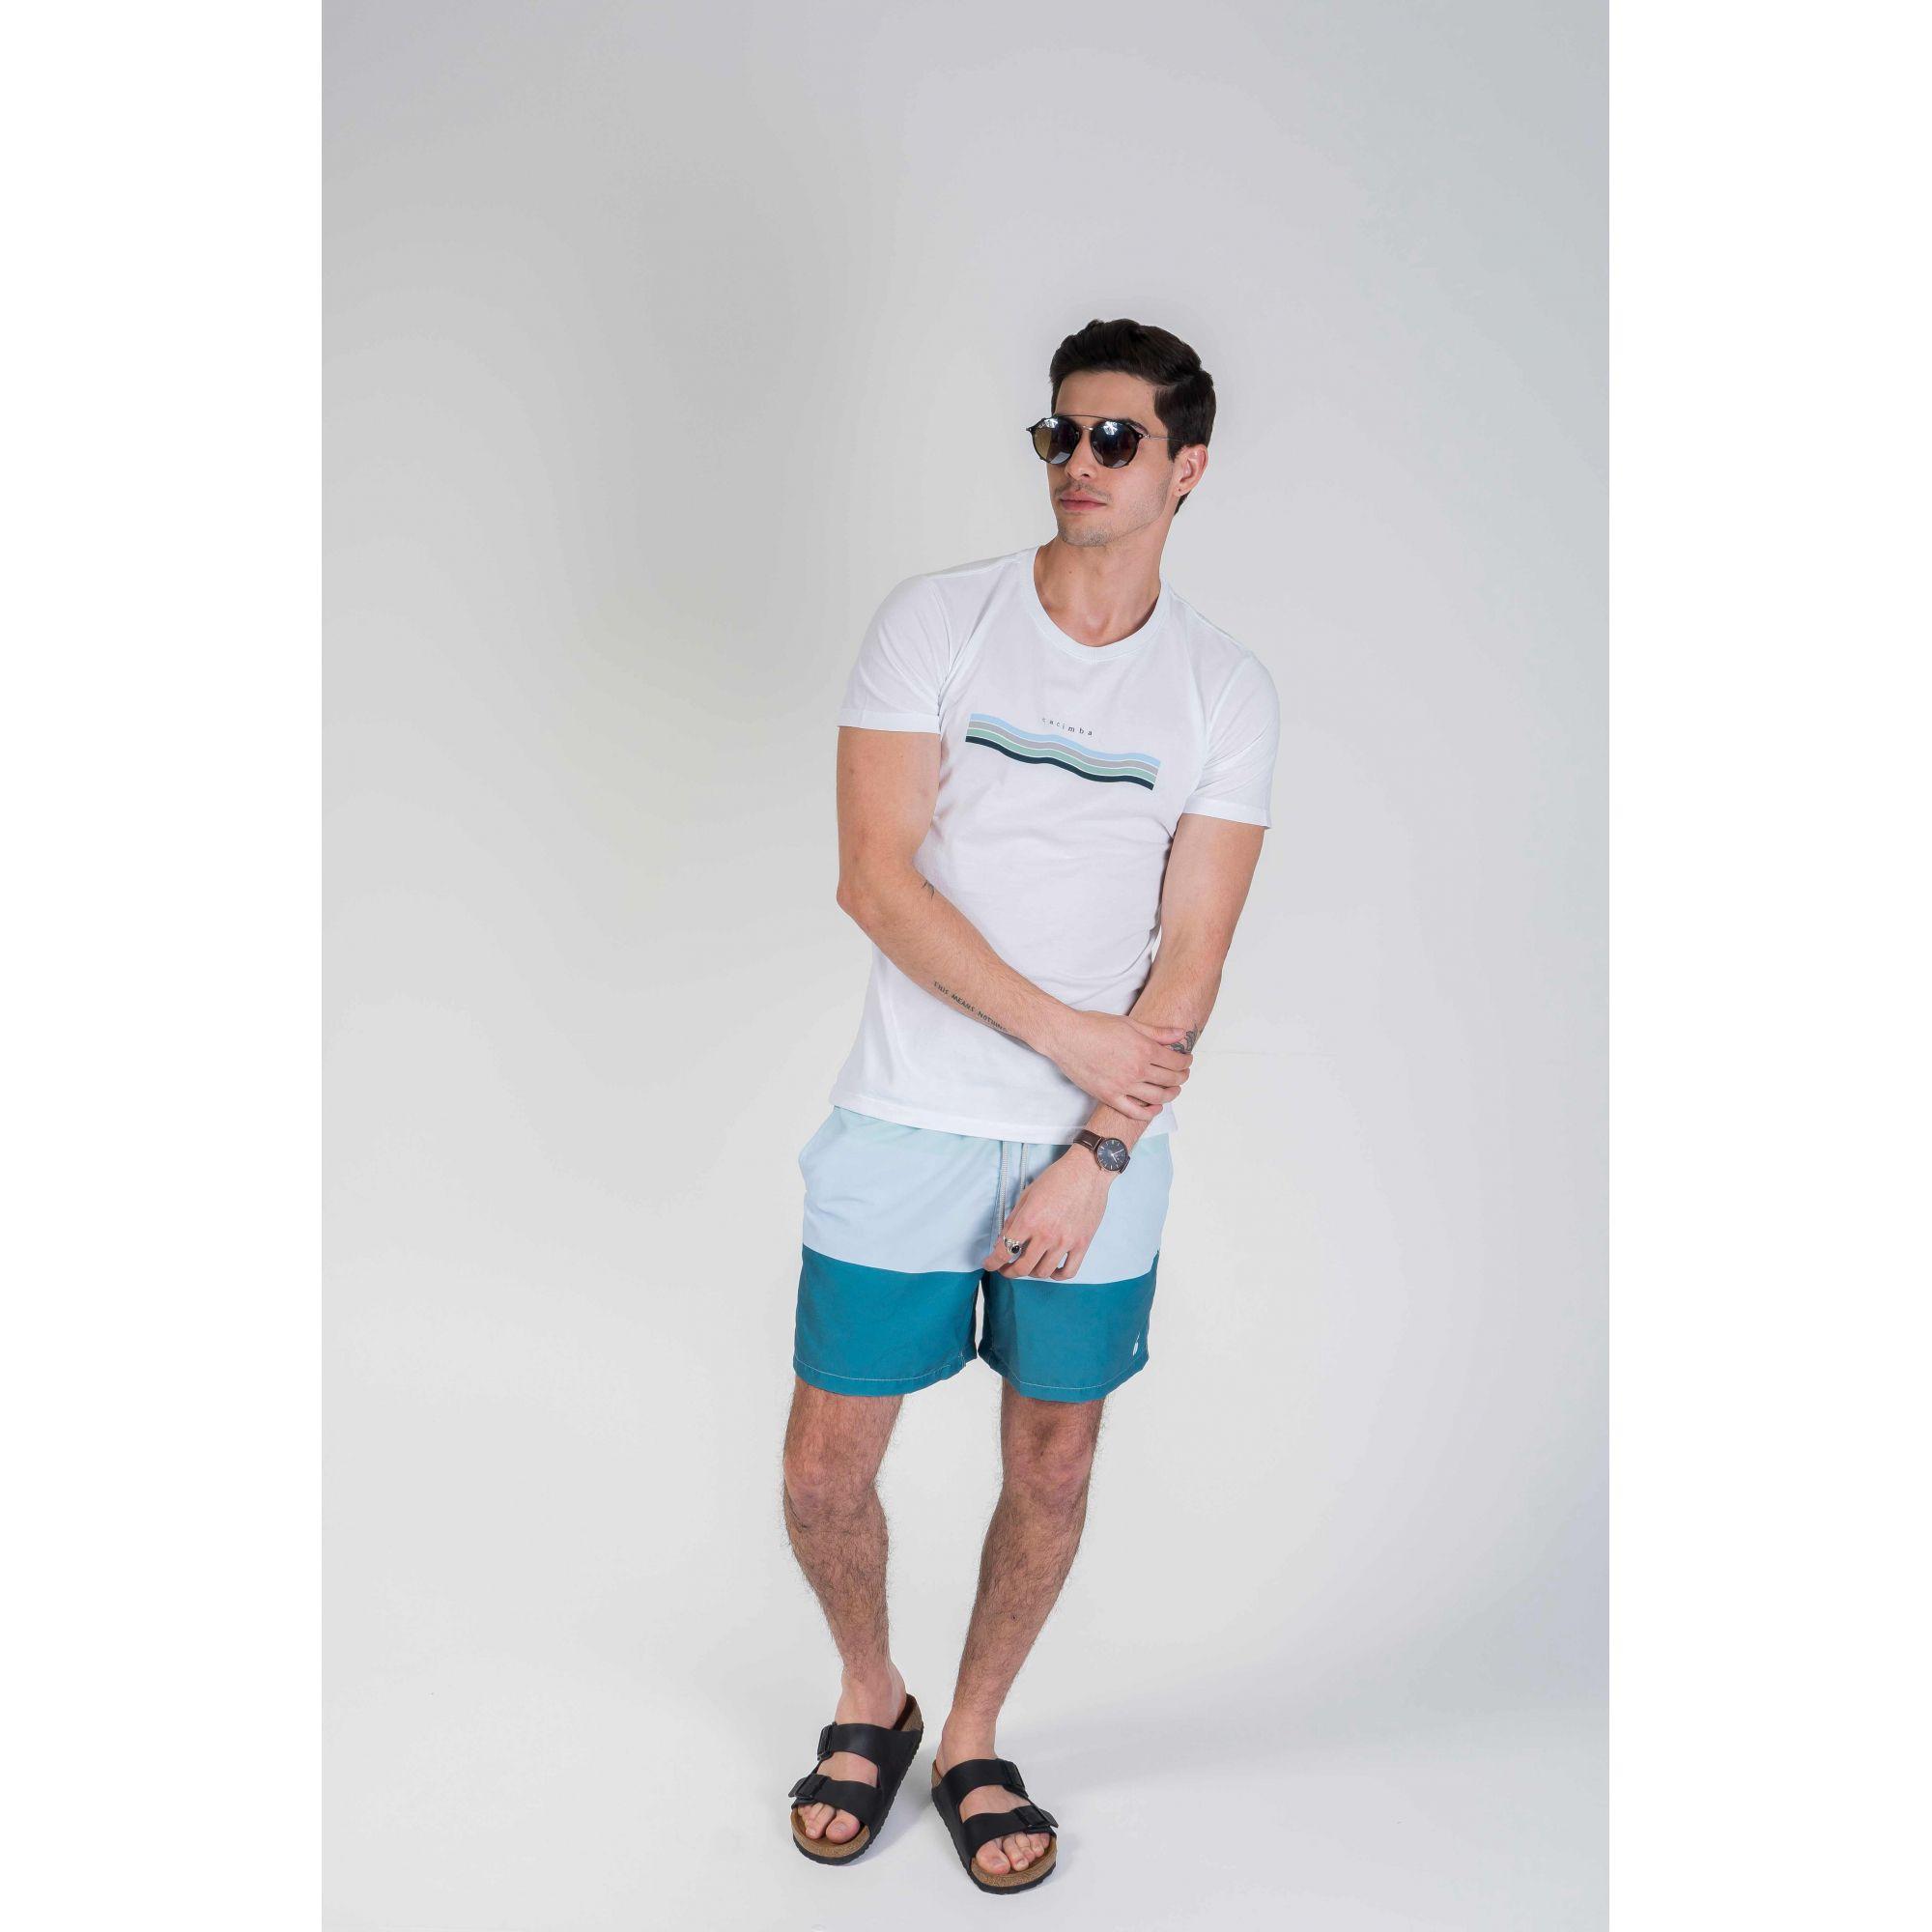 Shorts Tons Águas Brasileiras